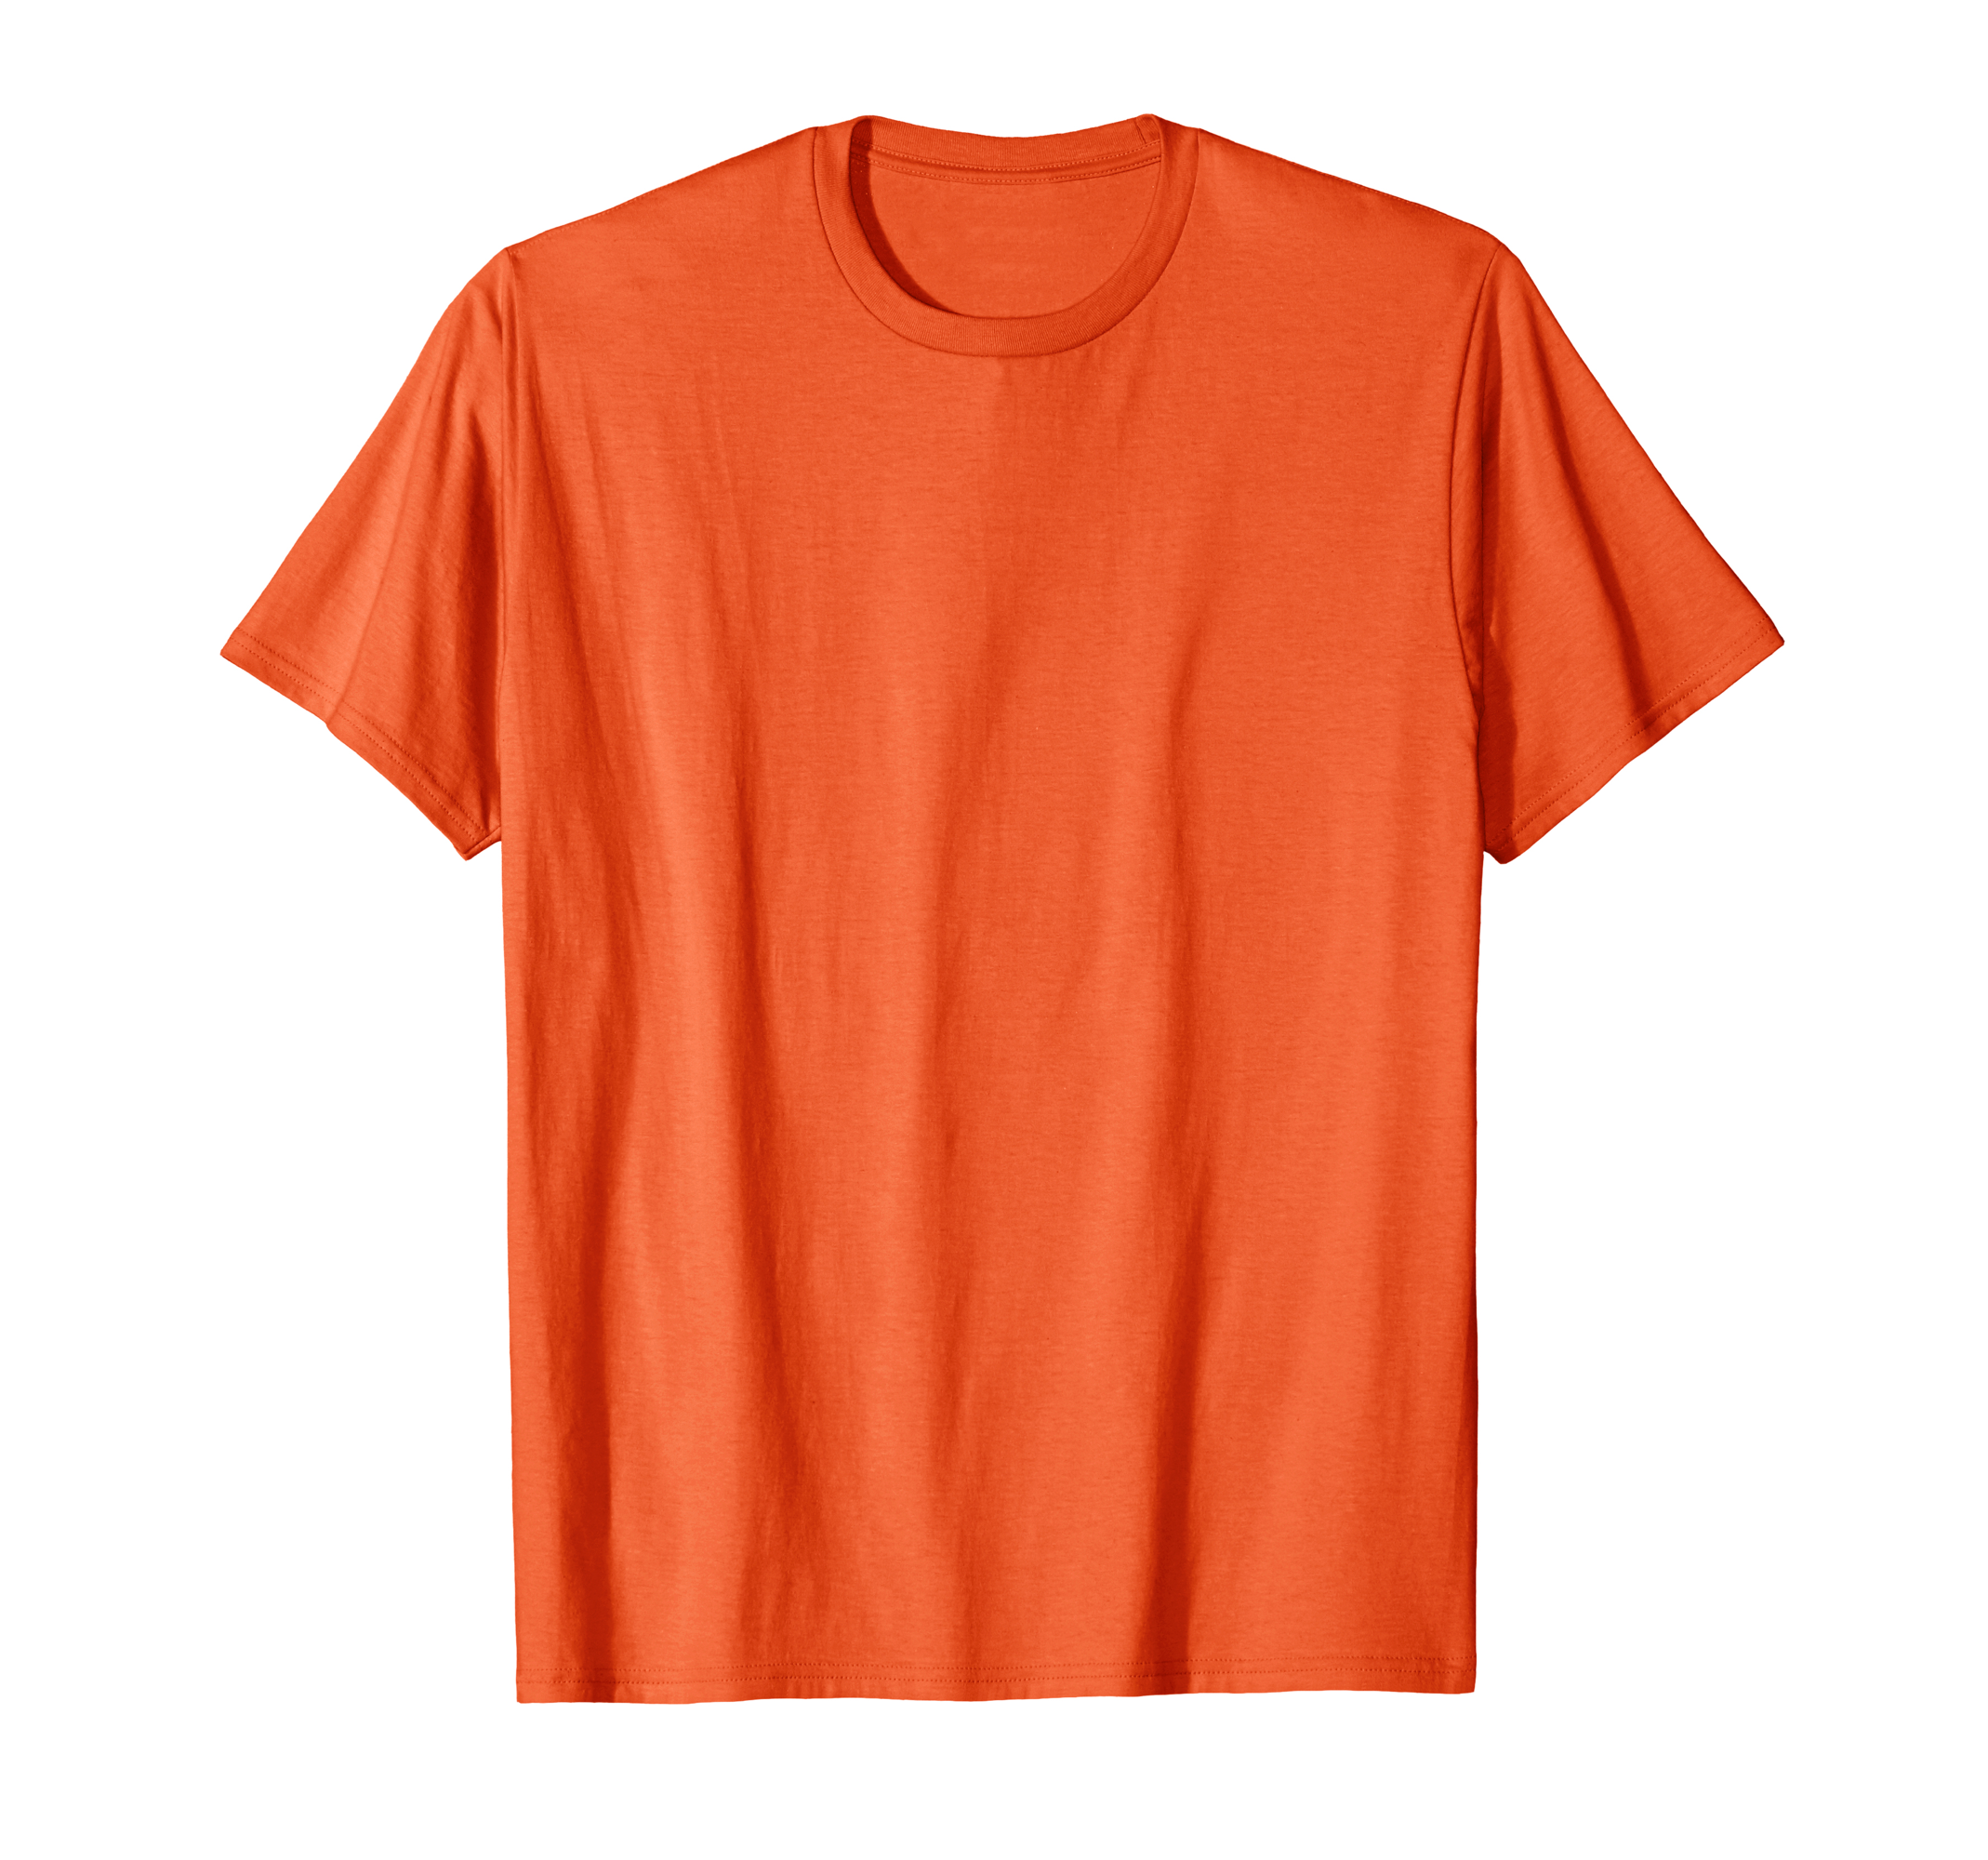 Cool Orange Clothes Art